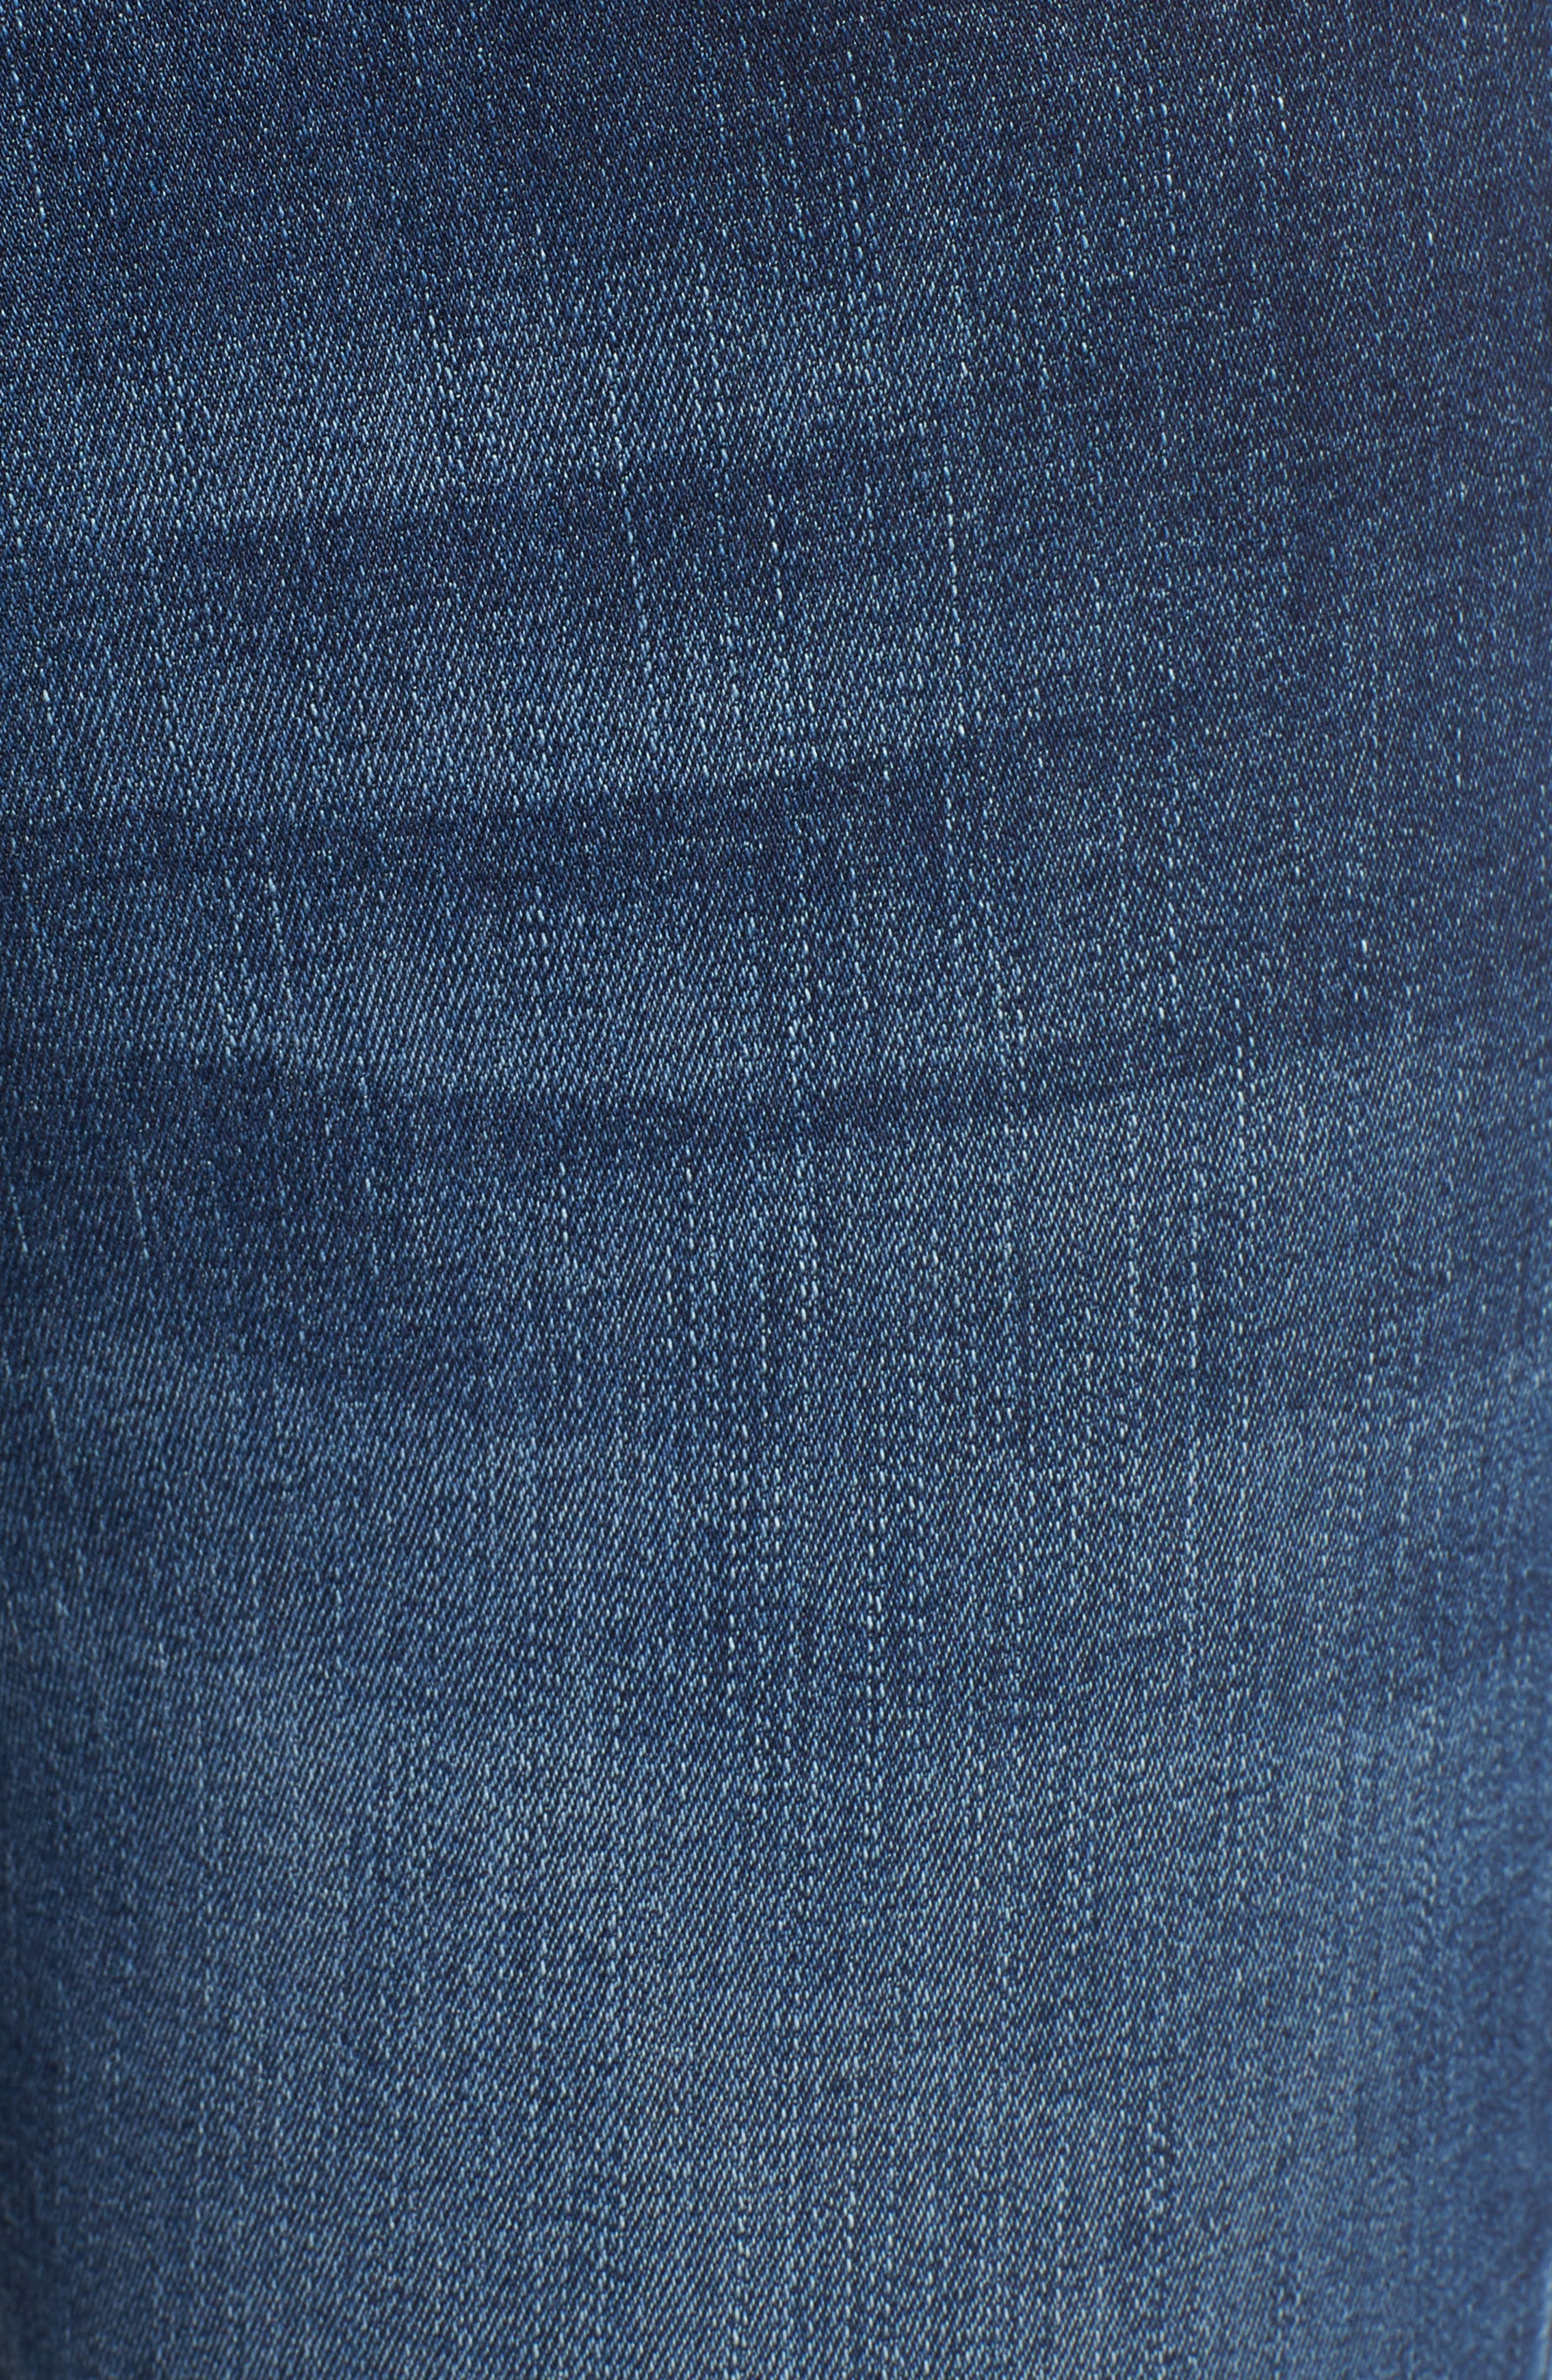 Chrissy Trimtone High Waist Skinny Jeans,                             Alternate thumbnail 5, color,                             Bal Harbour